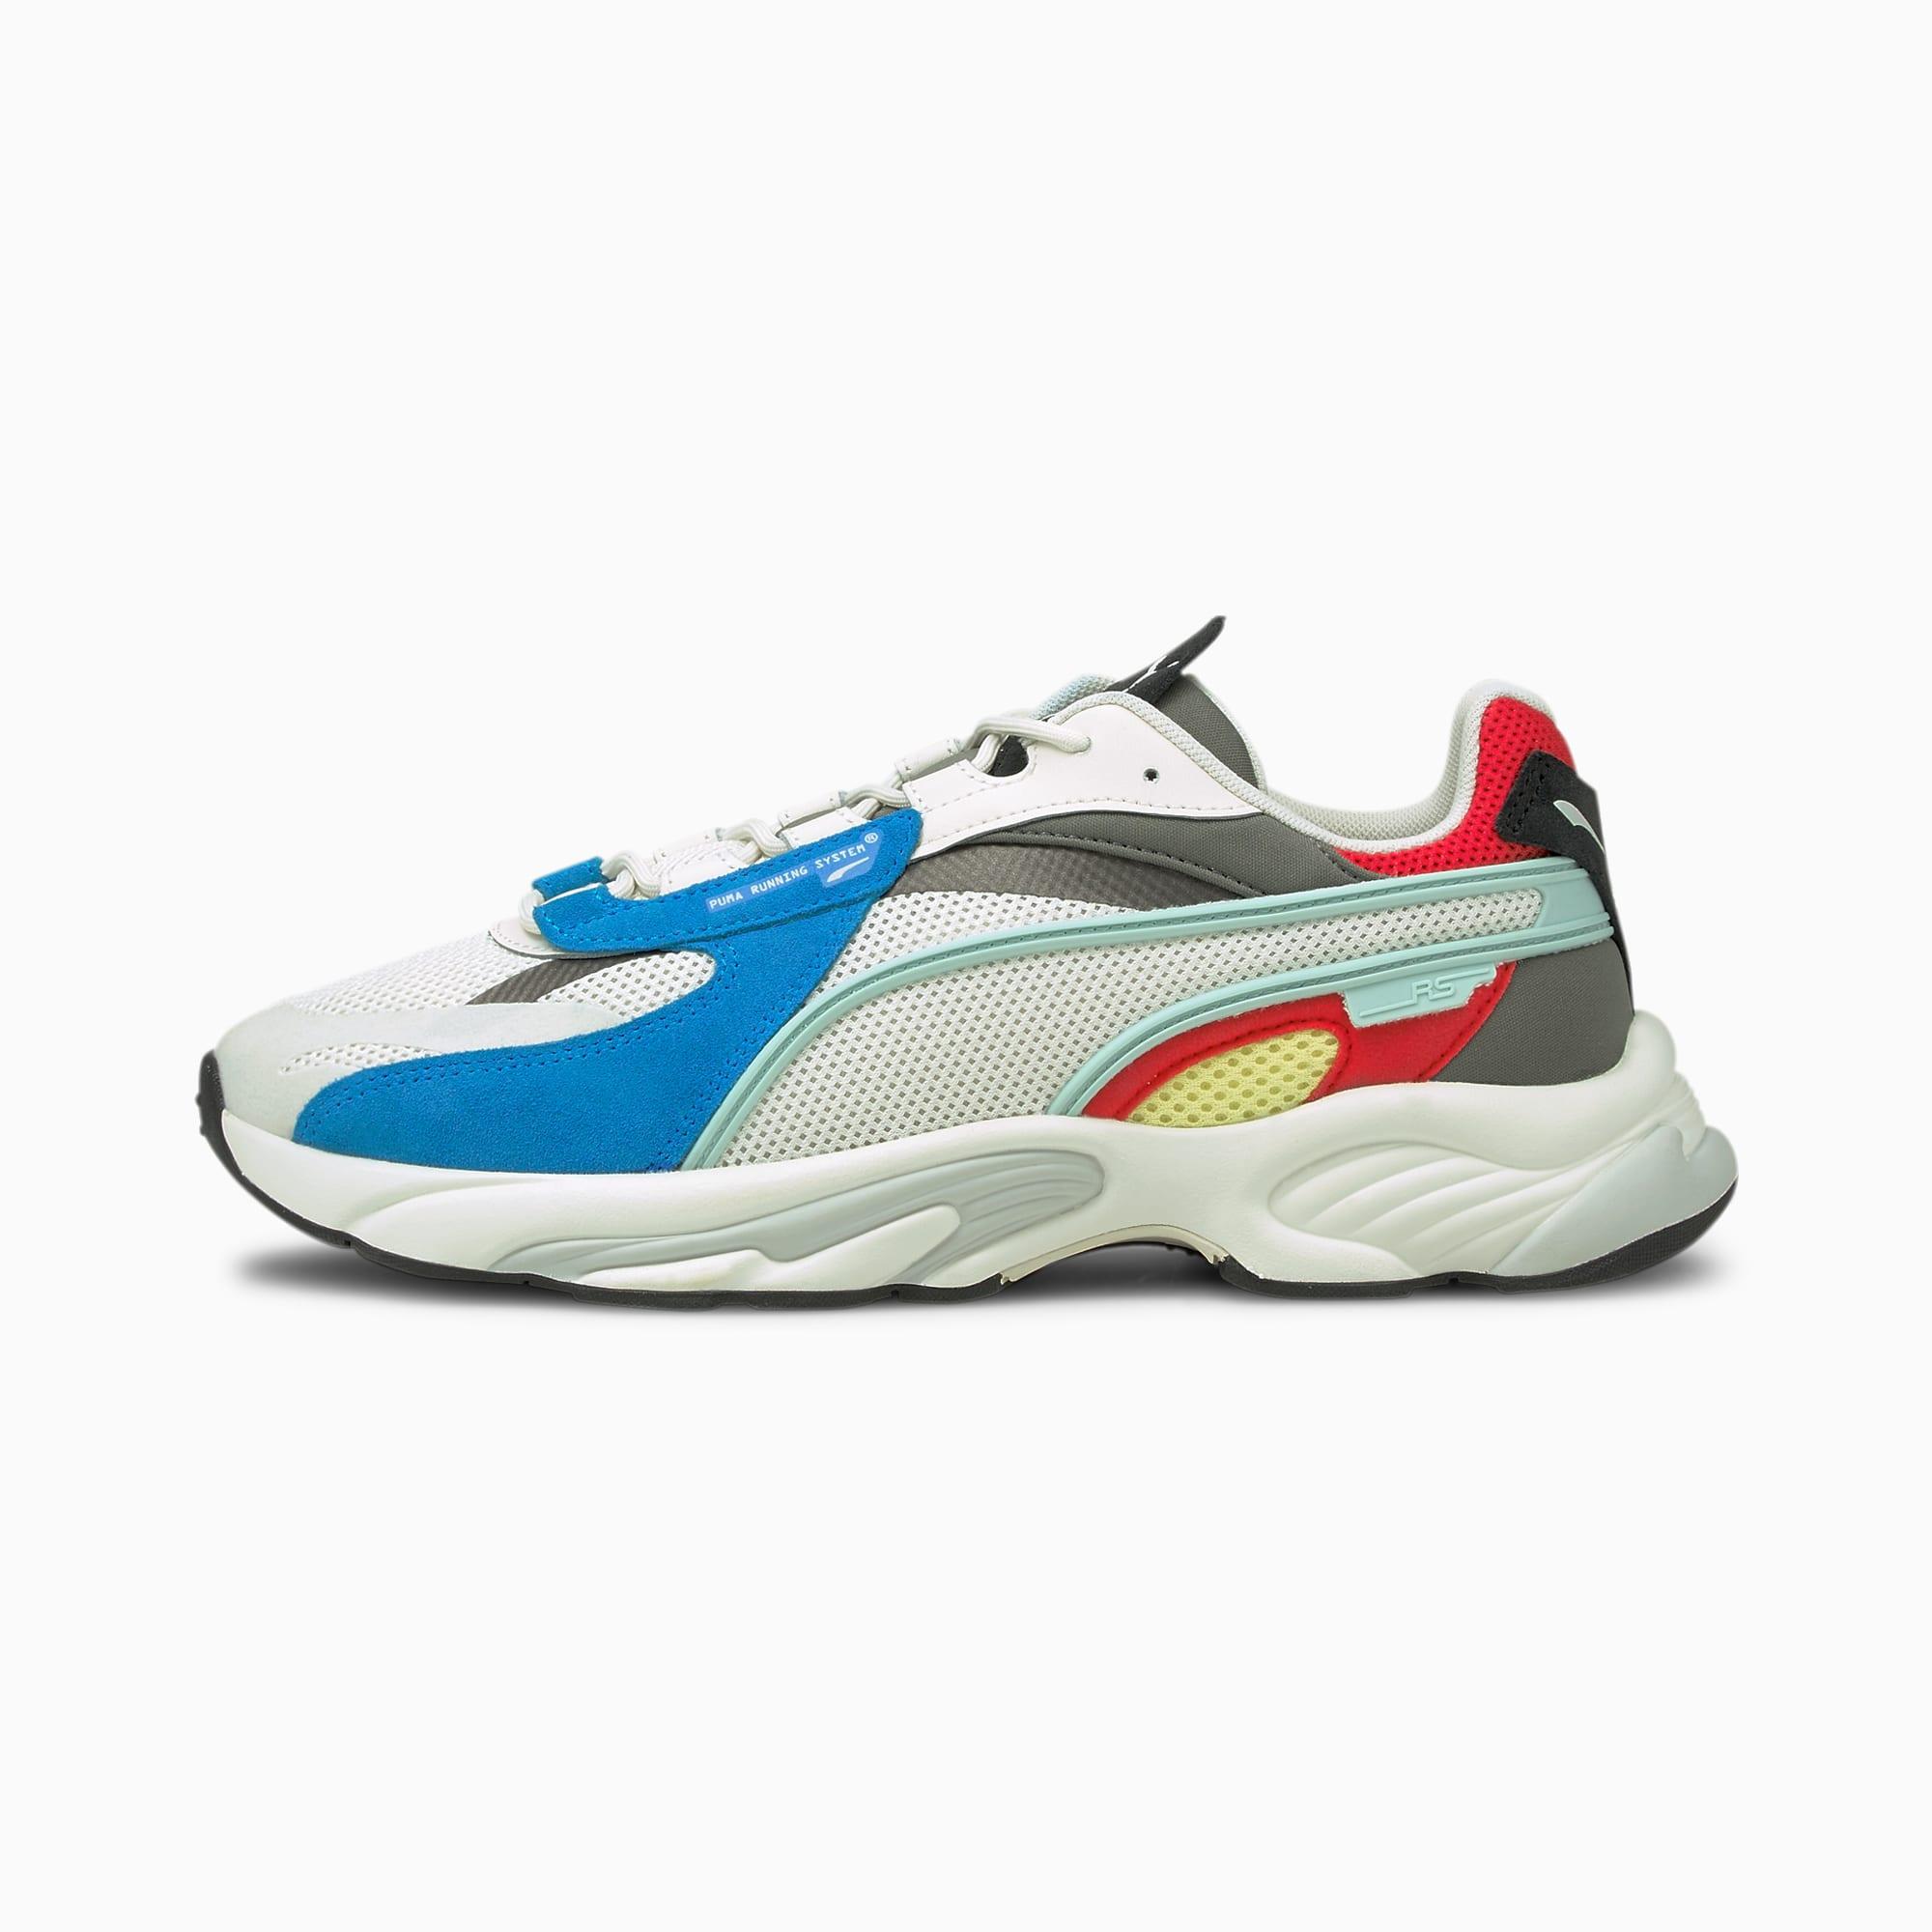 RS-Connect Lazer sneakers, Blauw/Grijs, Maat 35,5   PUMA